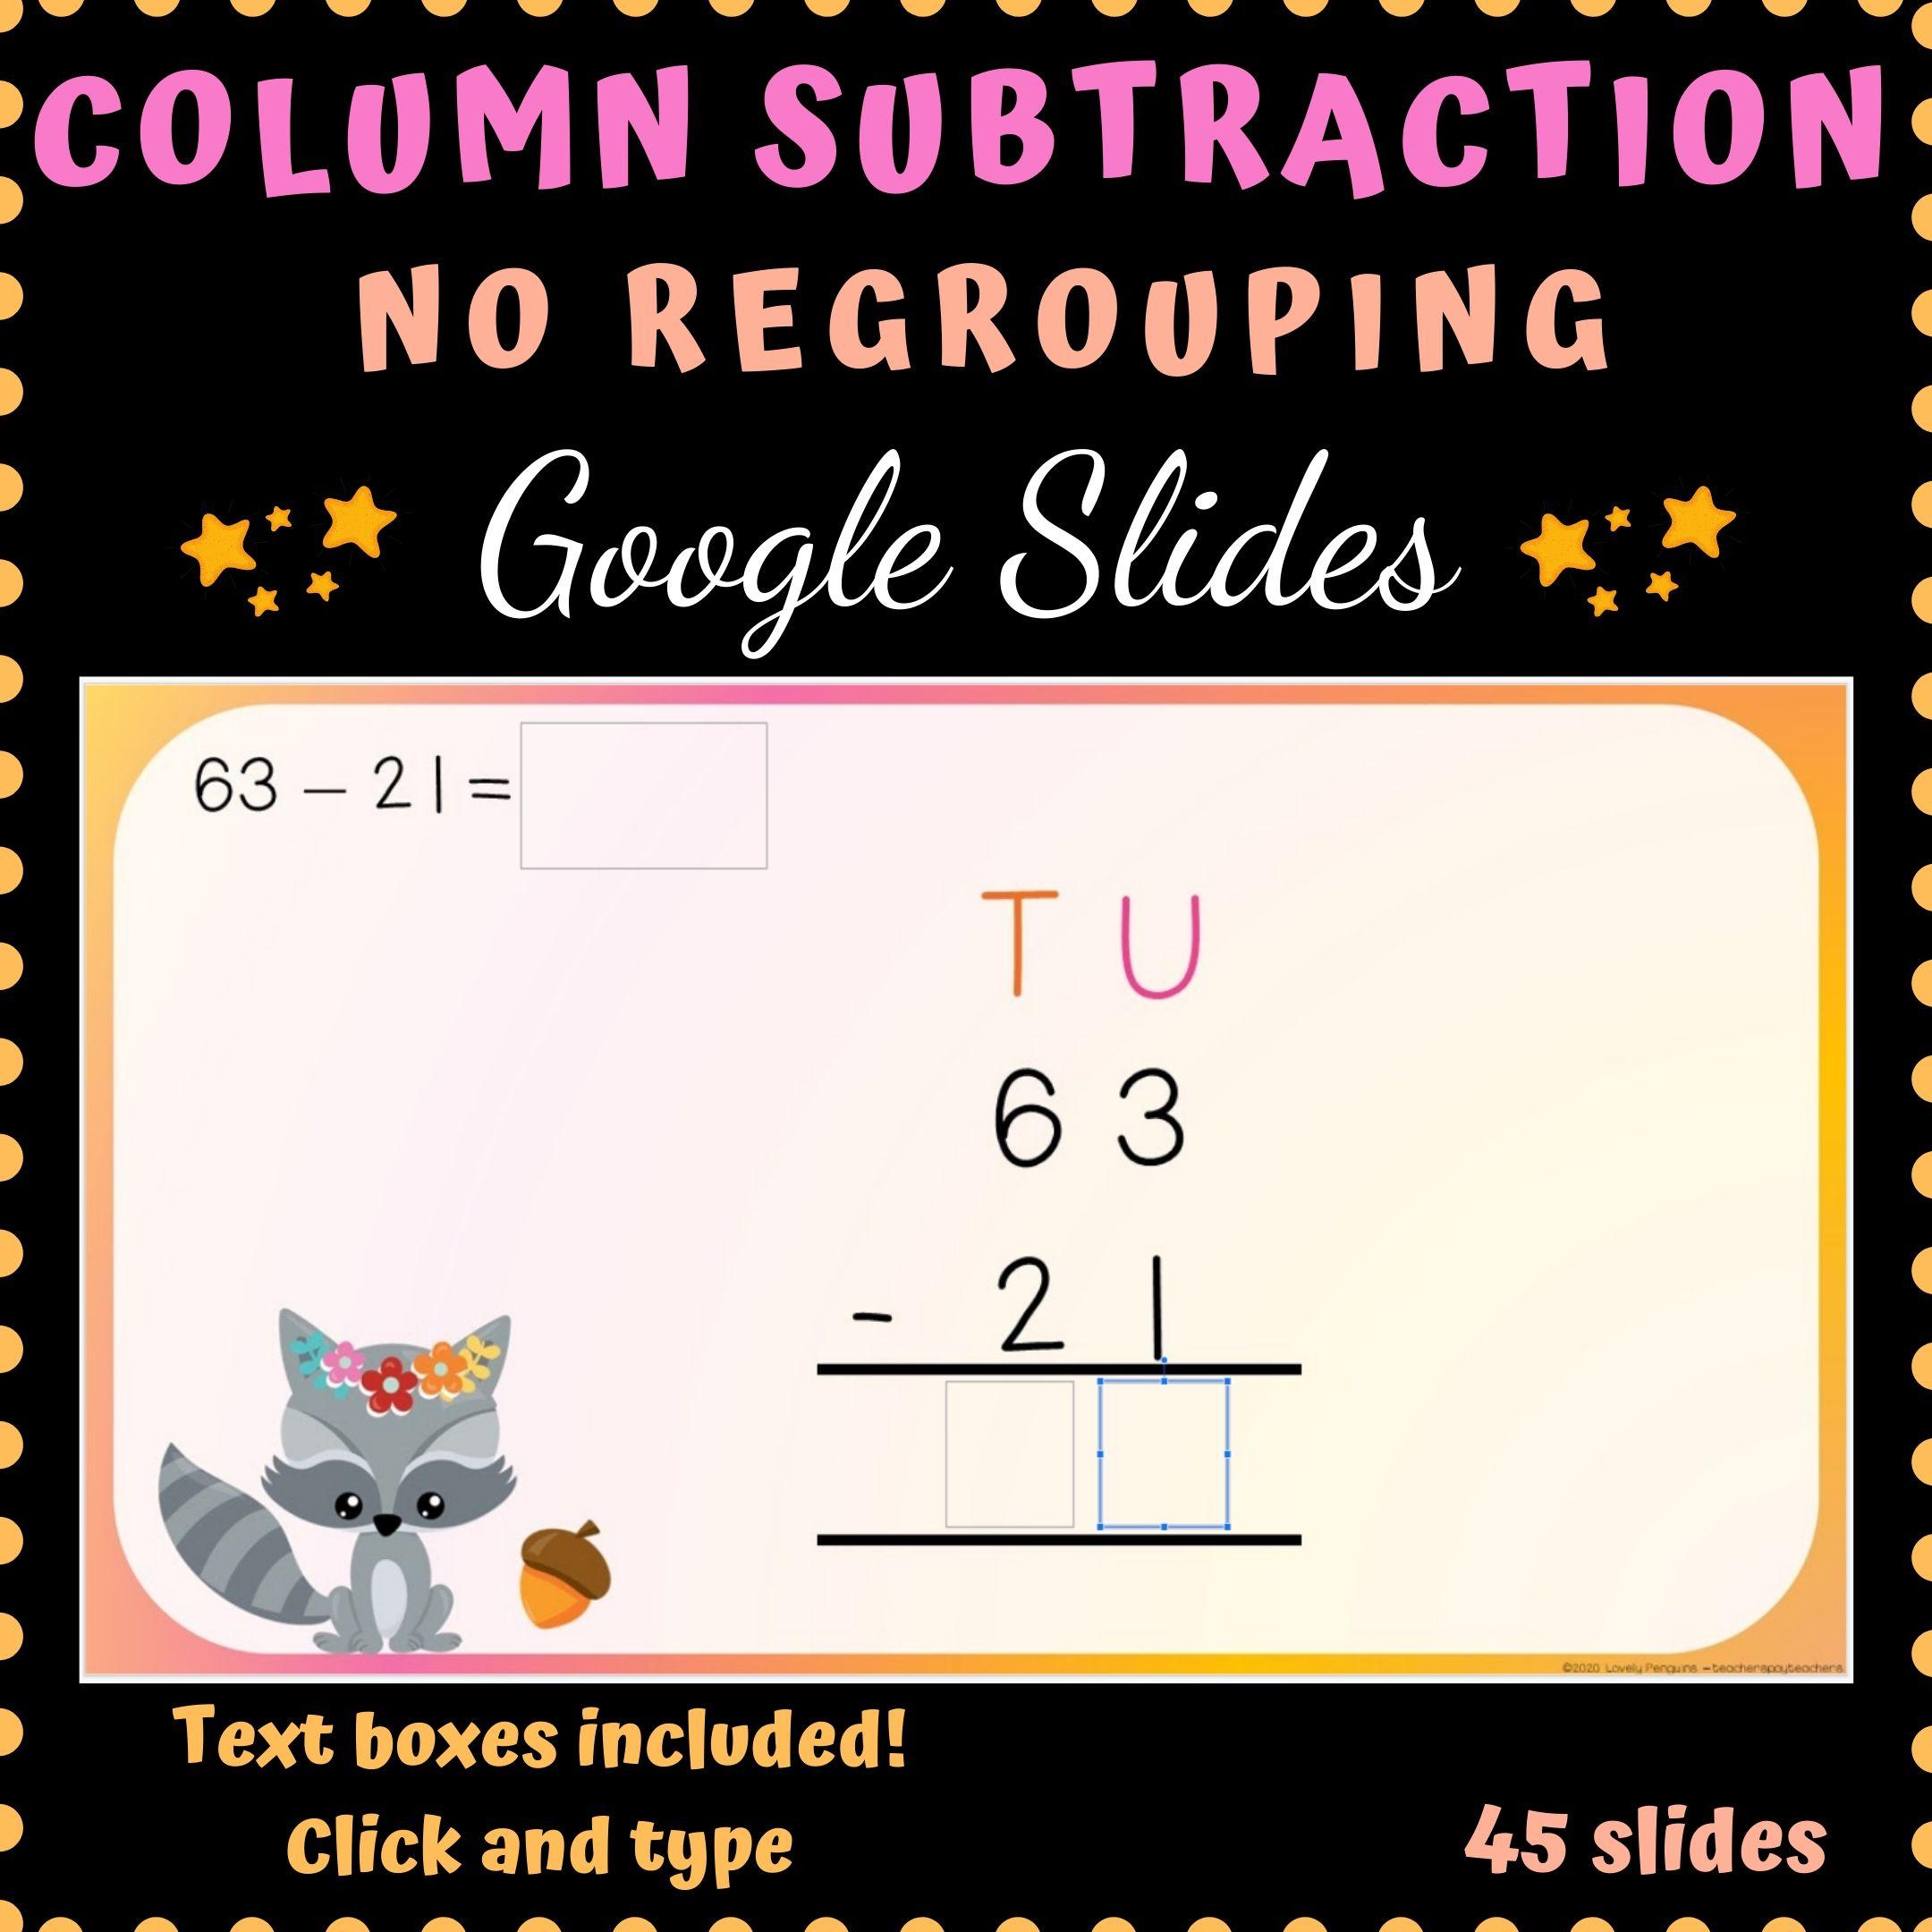 Column Subtraction No Regrouping Google Slides 2 Digits 3 Digits Subtraction Regrouping Addition And Subtraction How to explain column addition